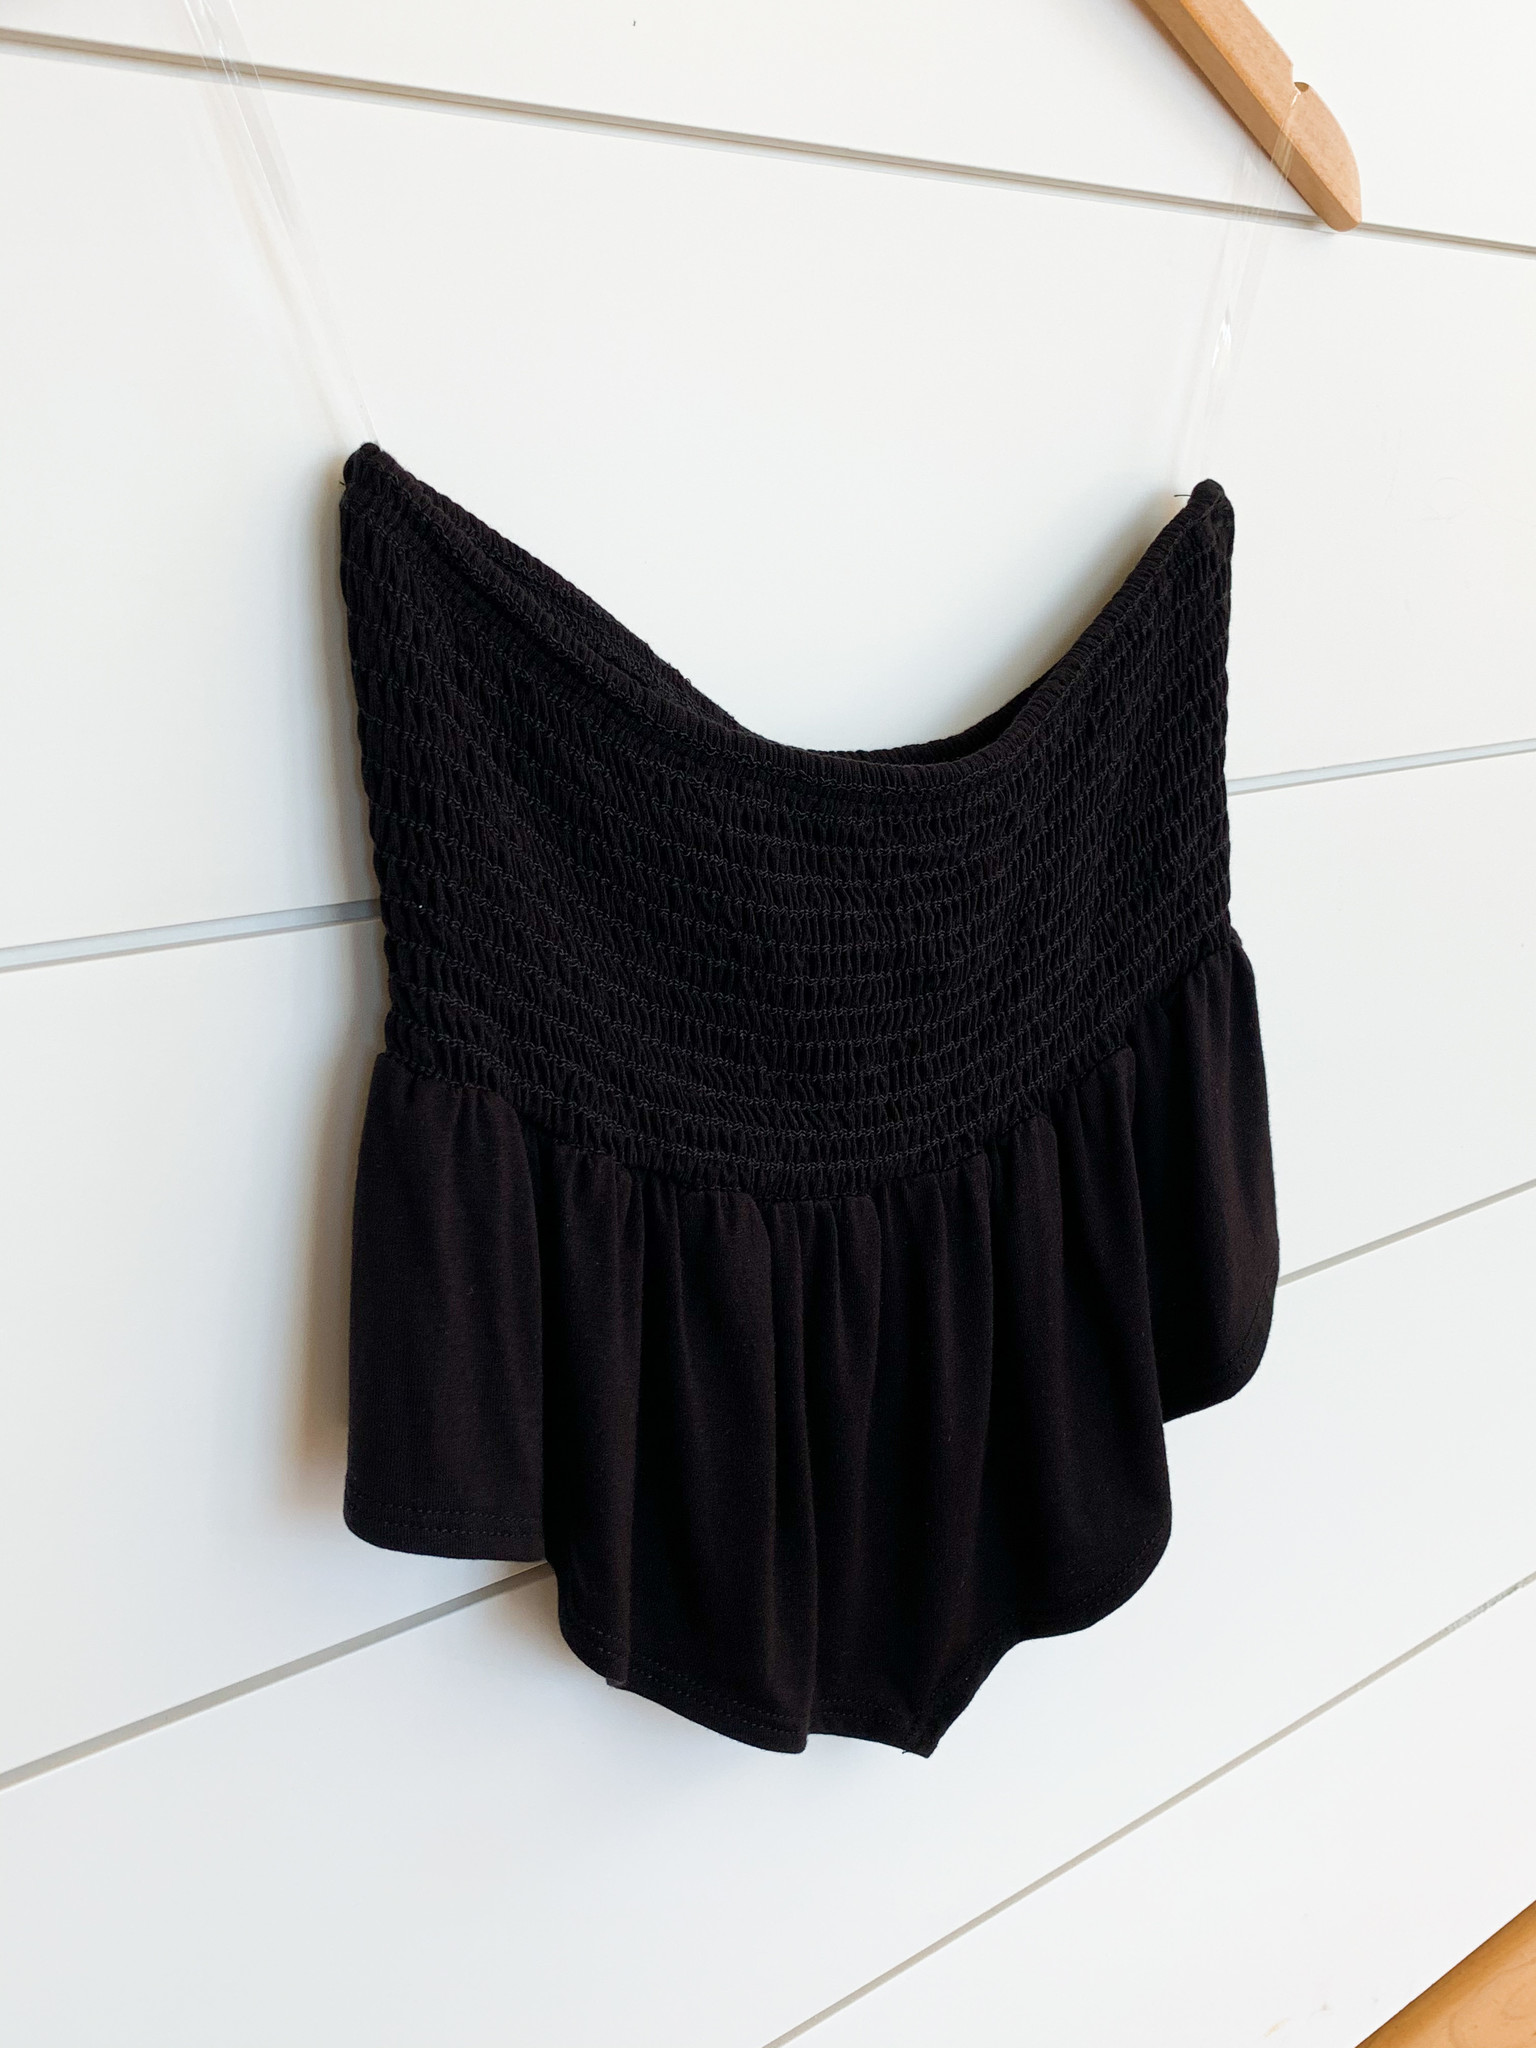 Black Ruffled Smocked Strapless Top